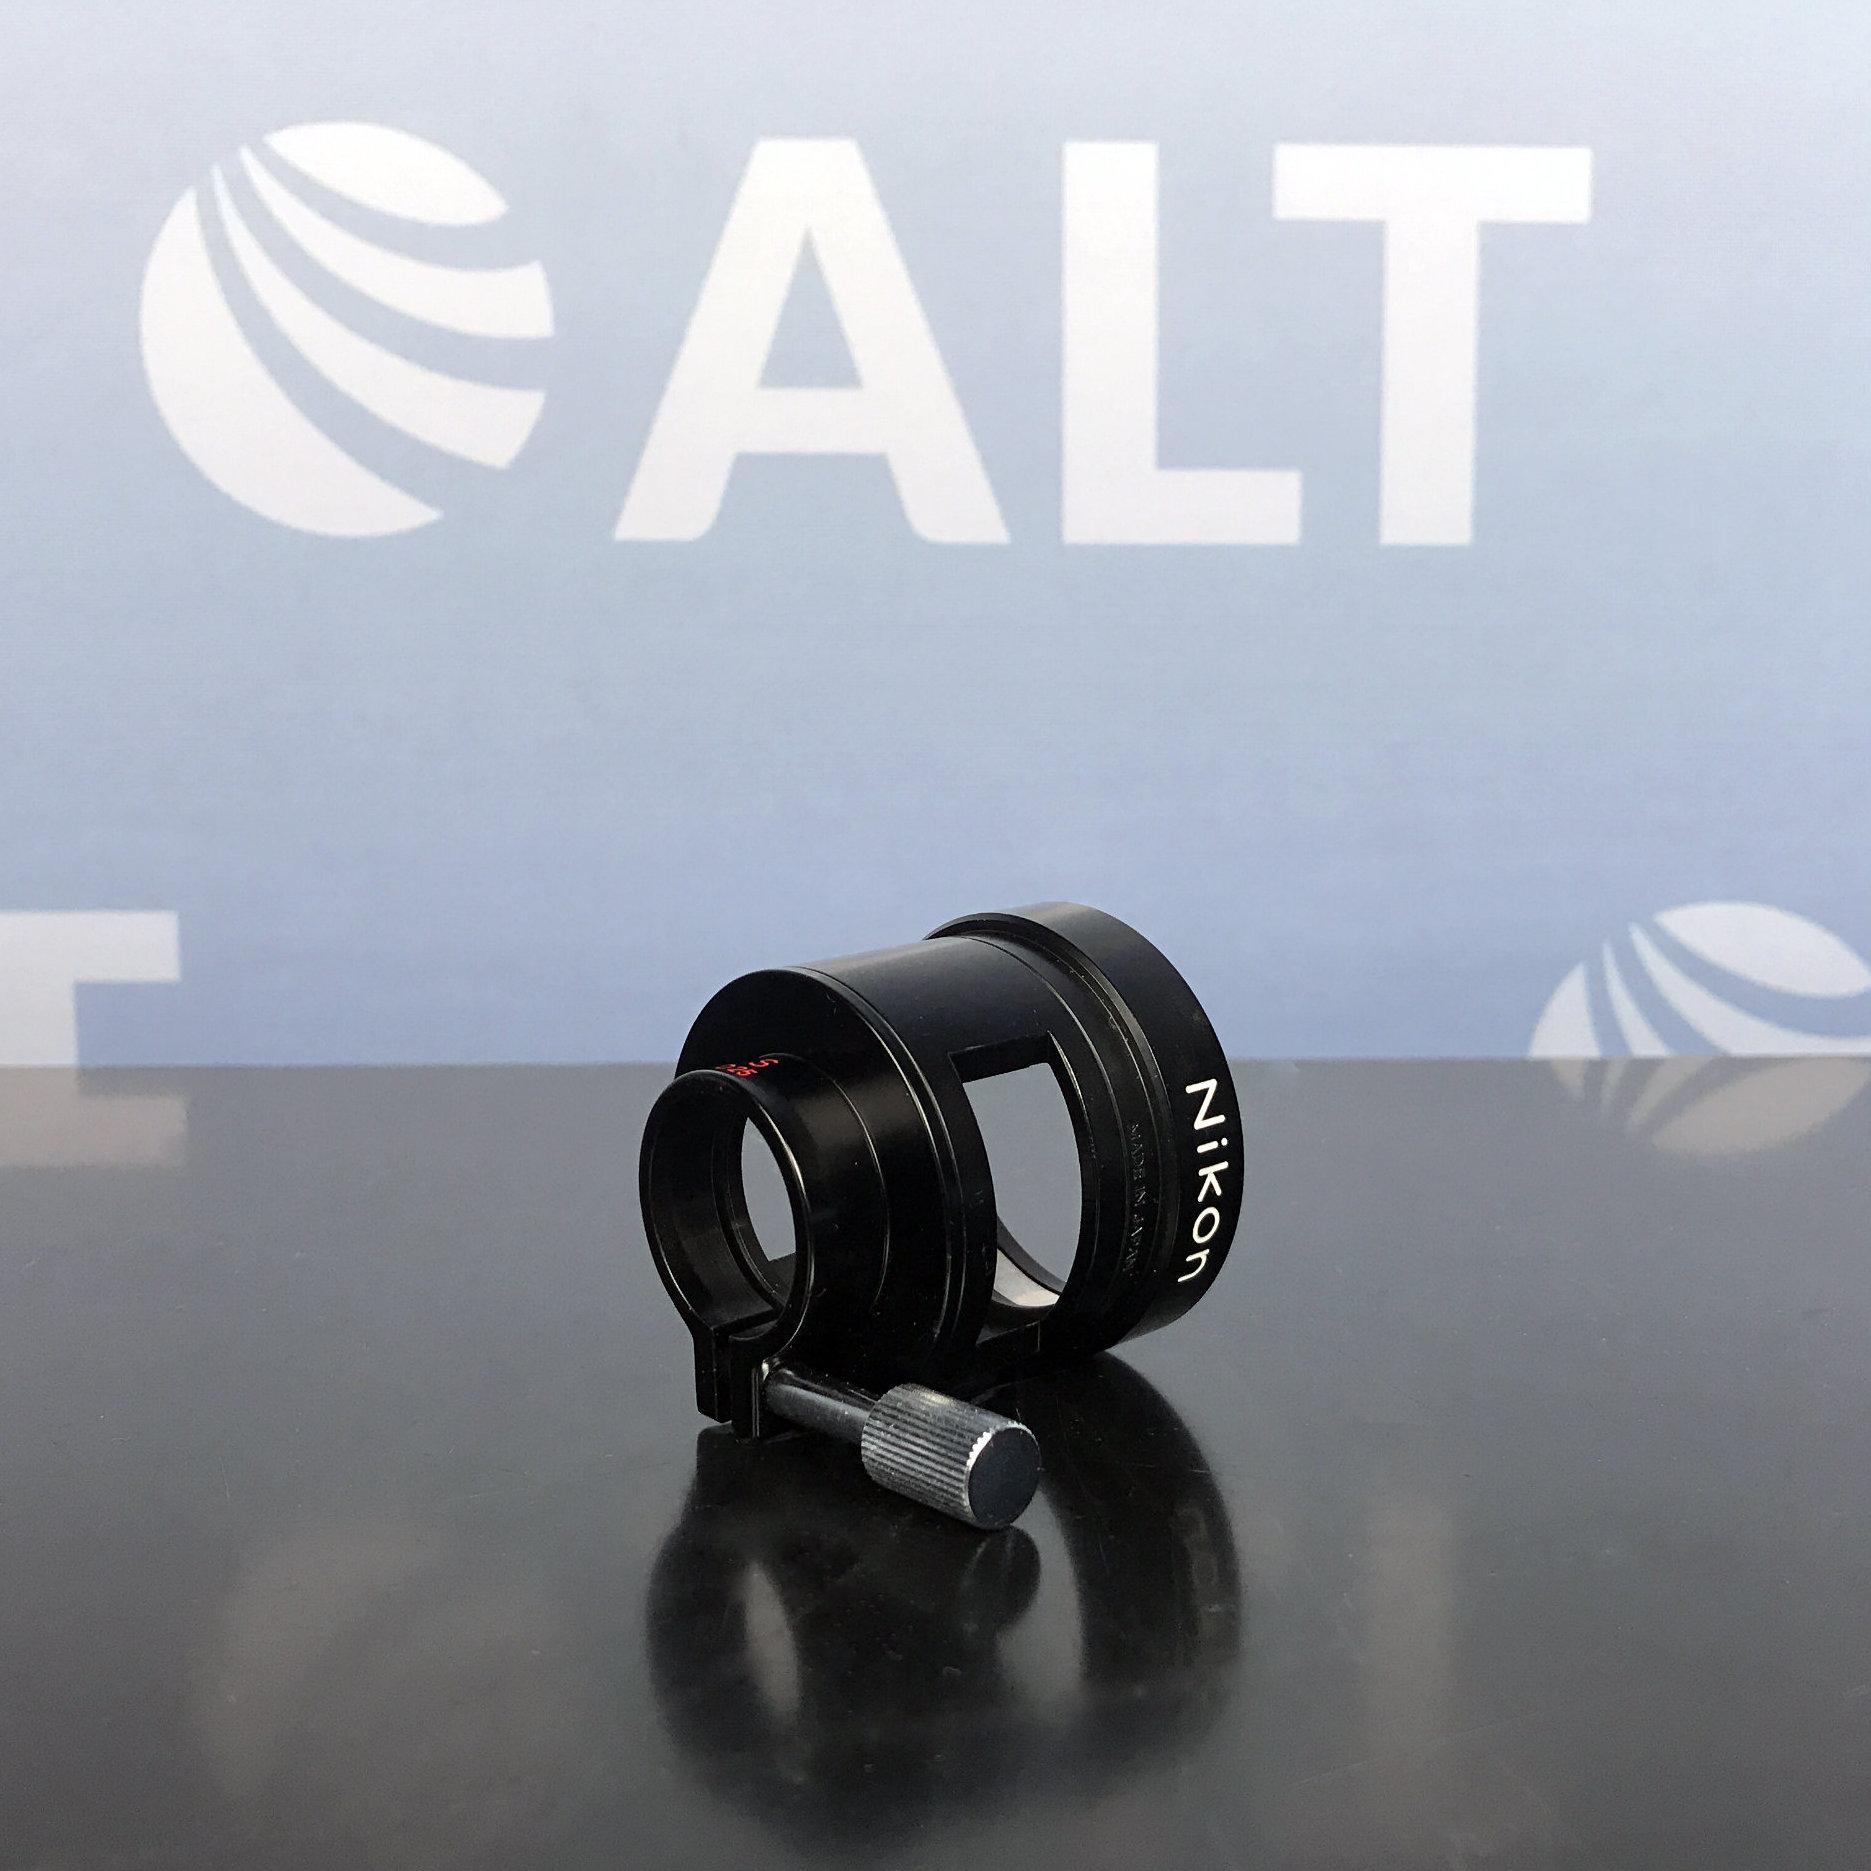 Nikon S D25 Microscope Adapter Image